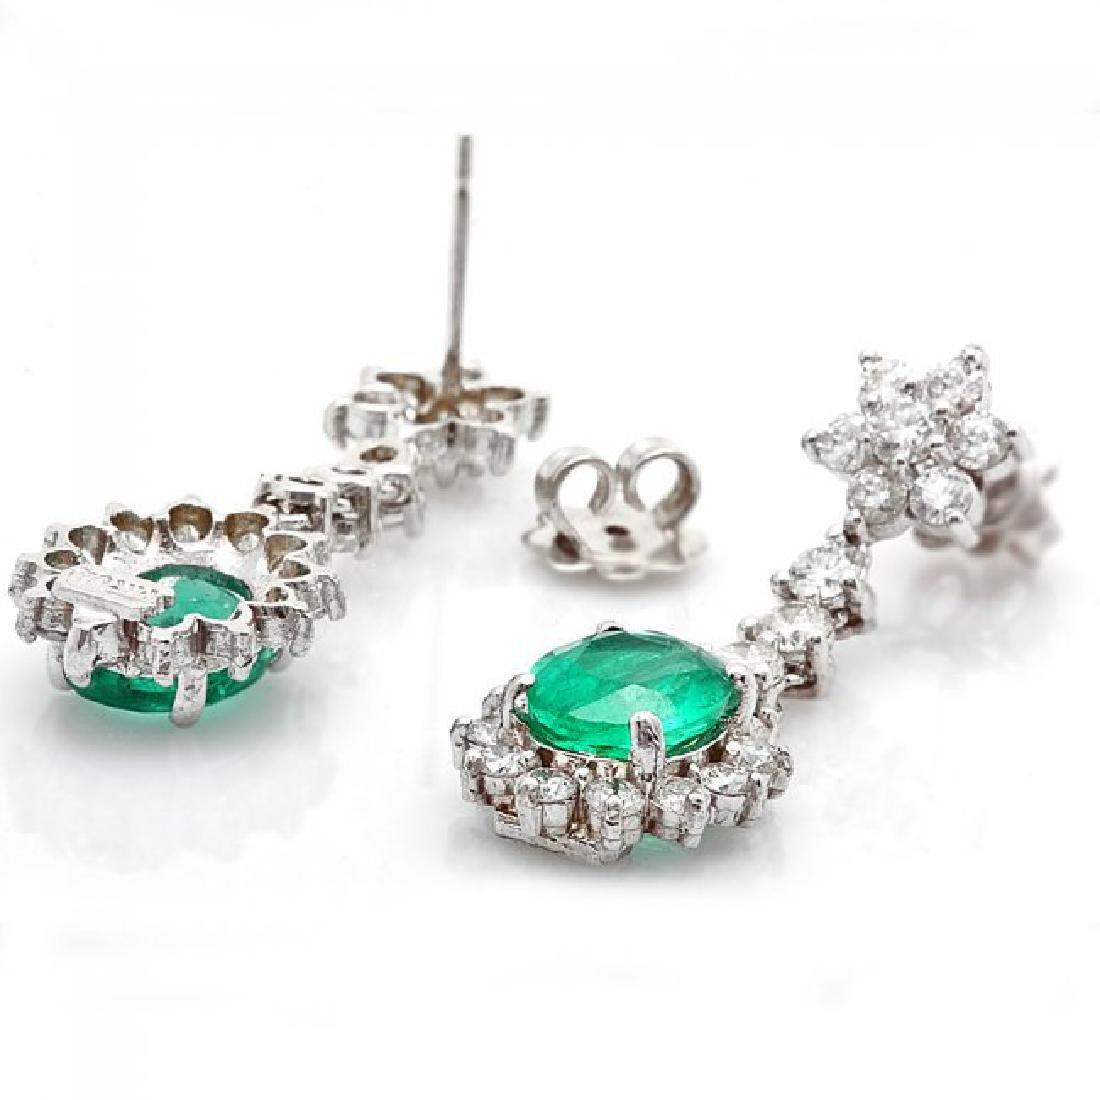 14k W Gold 3.50ct Emerald 2.50ct Diamond Earrings - 2